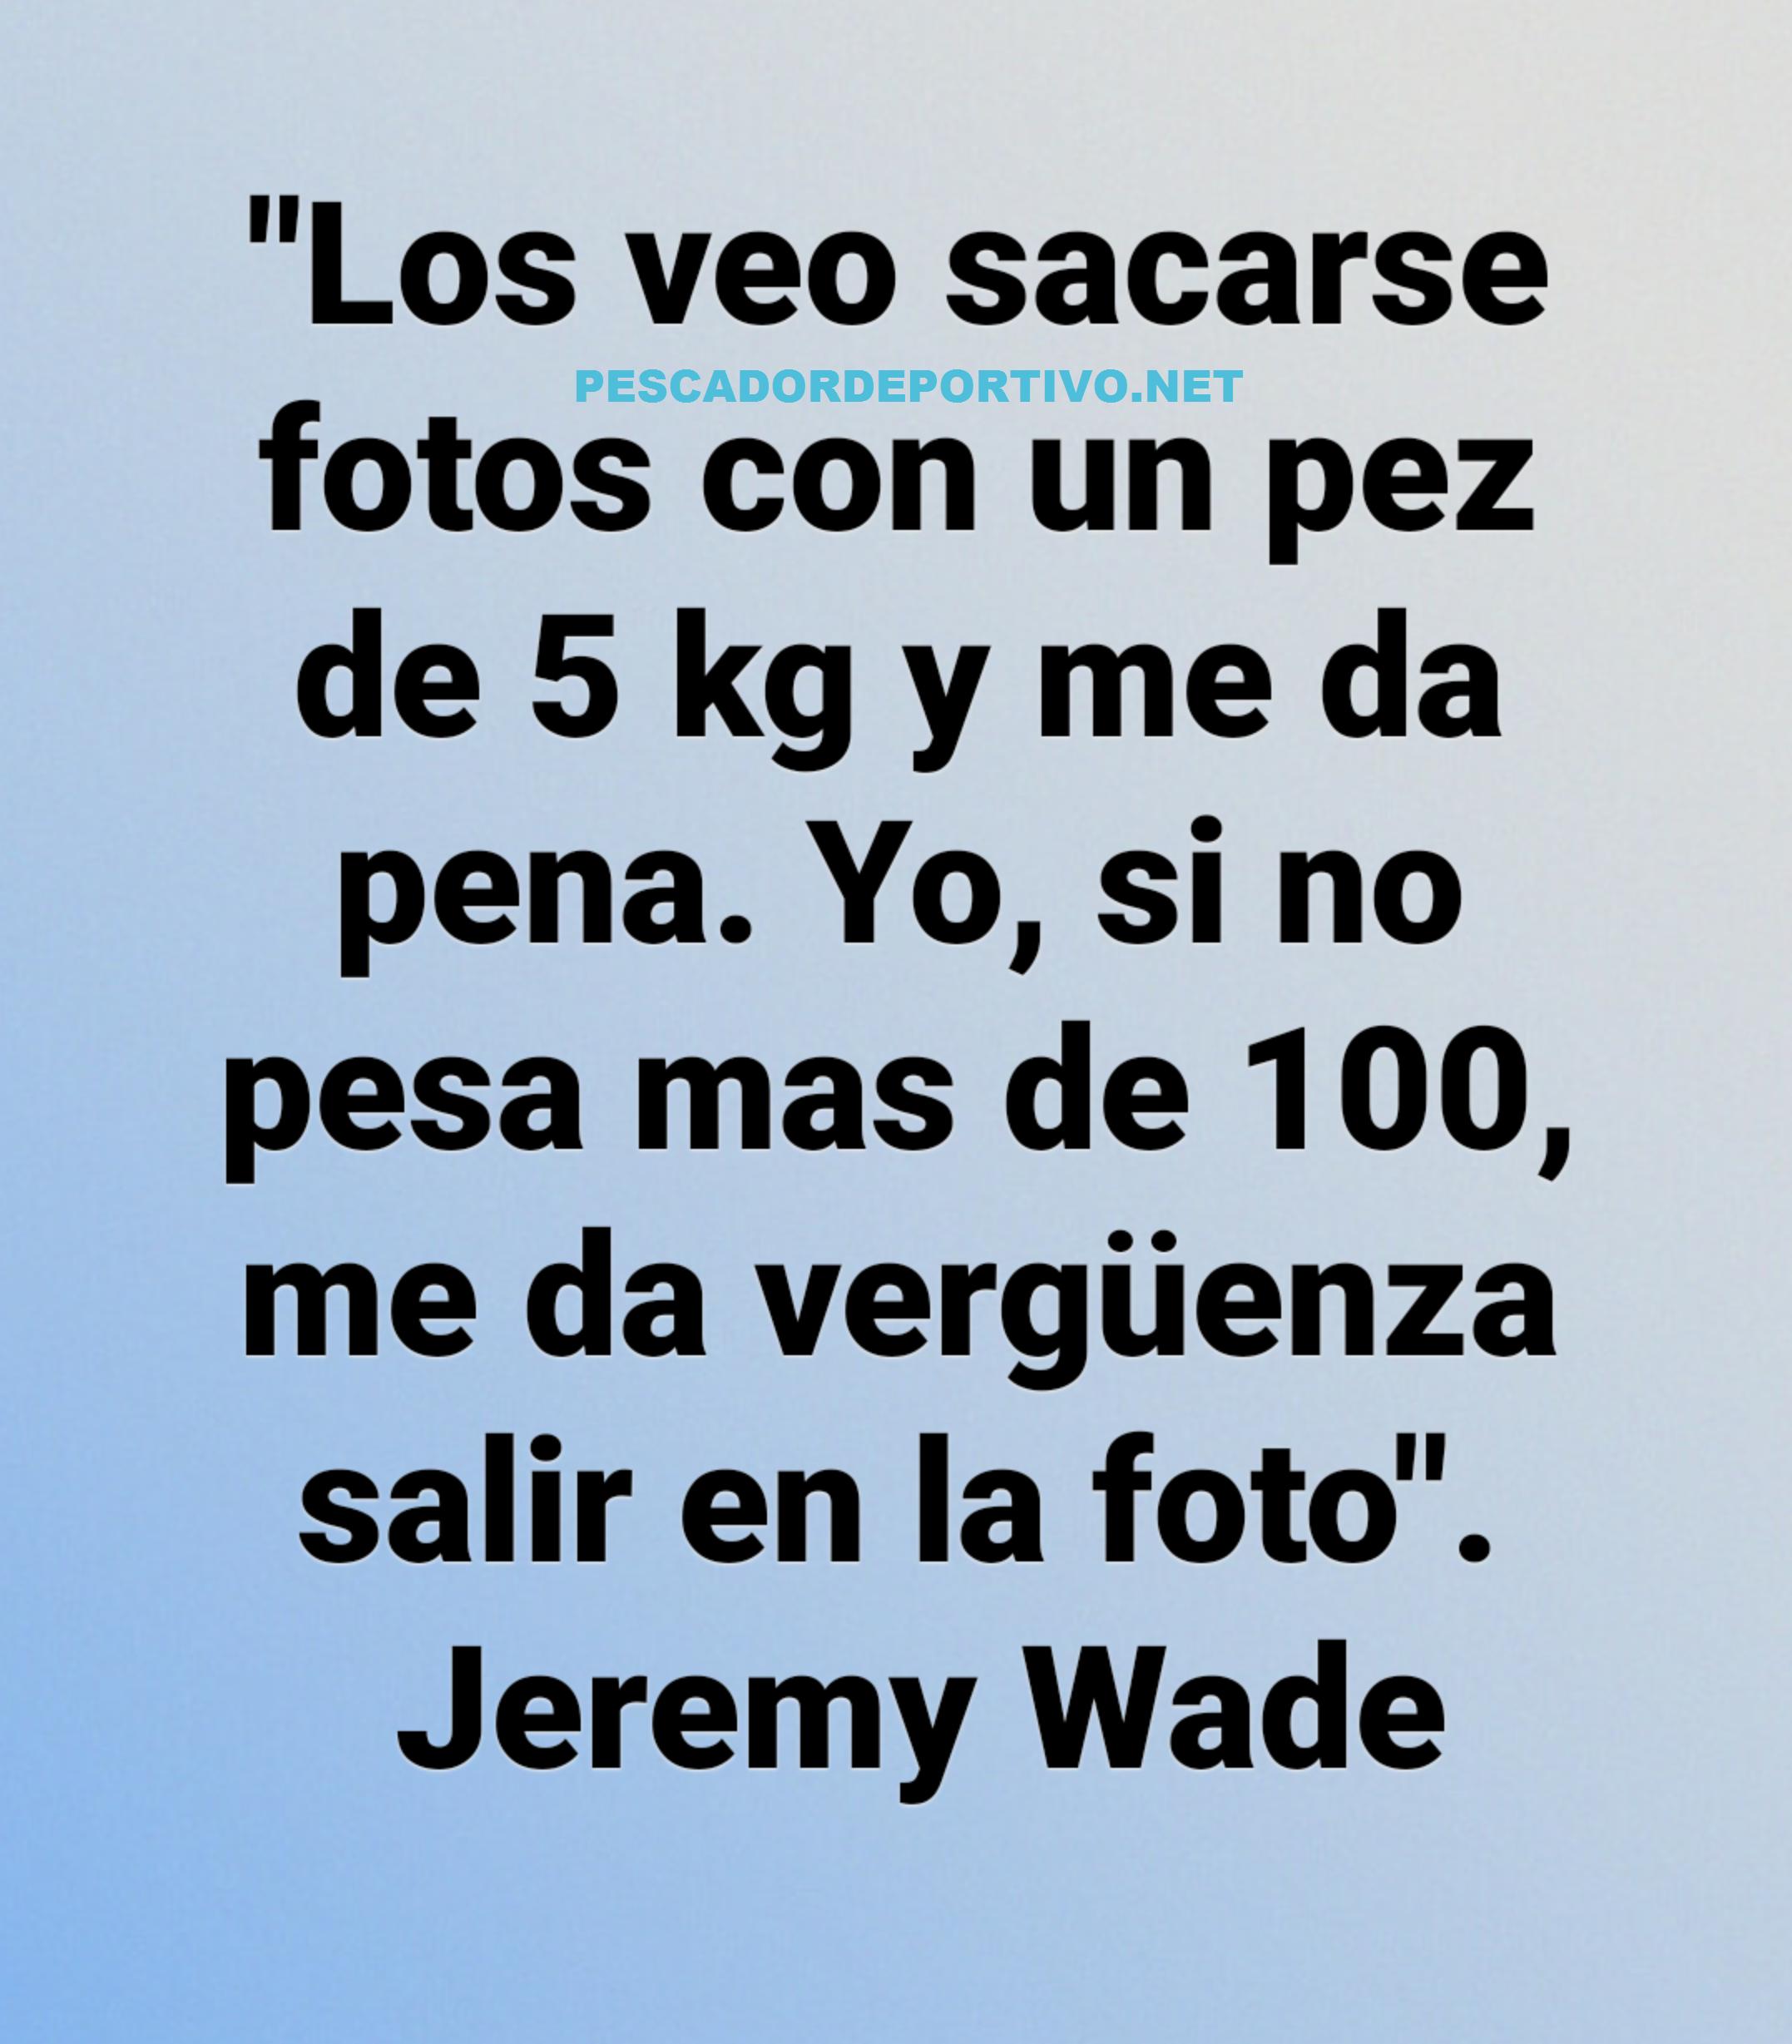 Meme Jeremy Wade 9